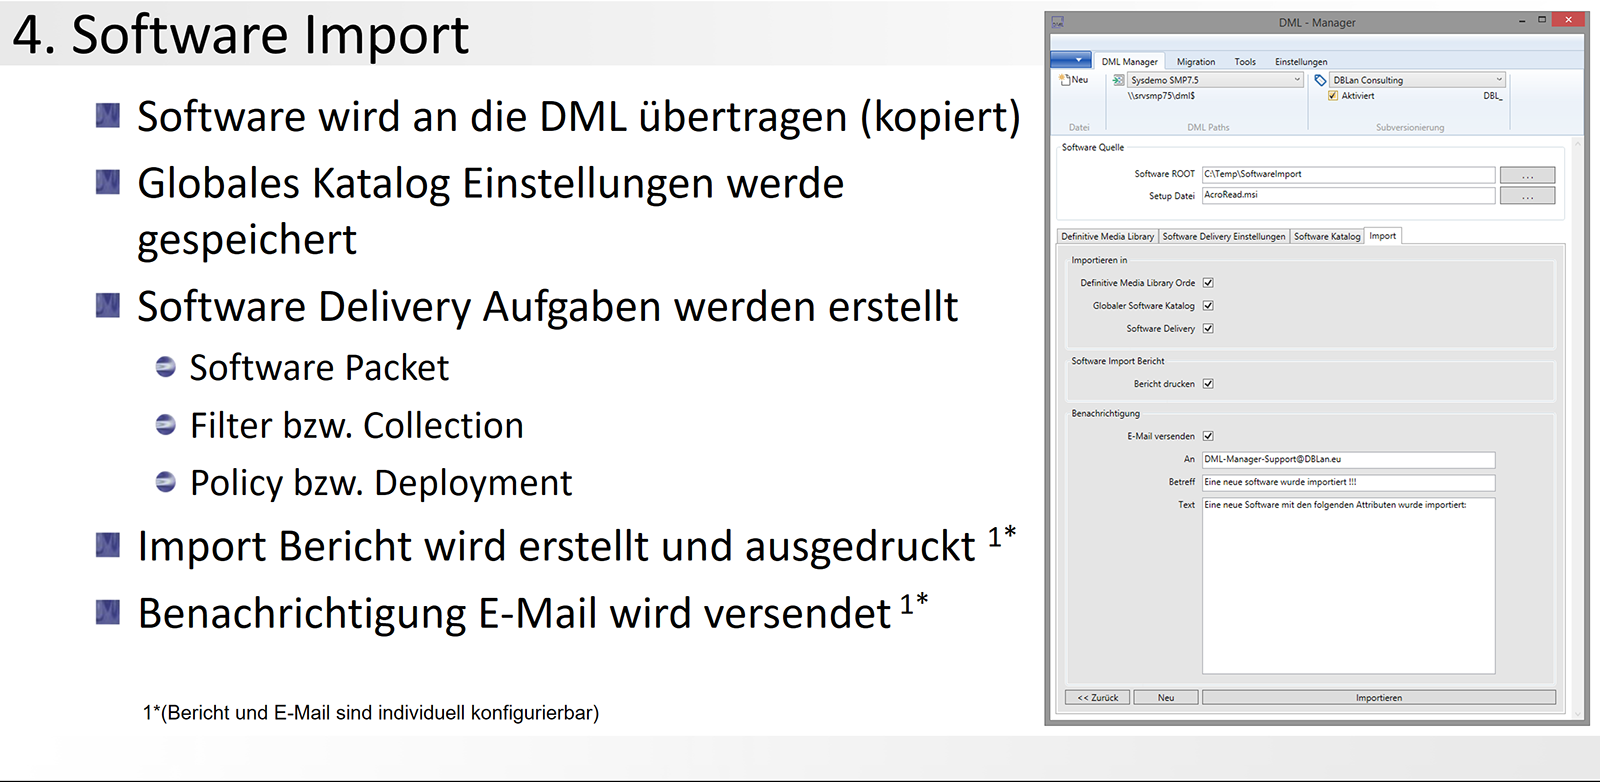 4. DML-Manager - Software Import